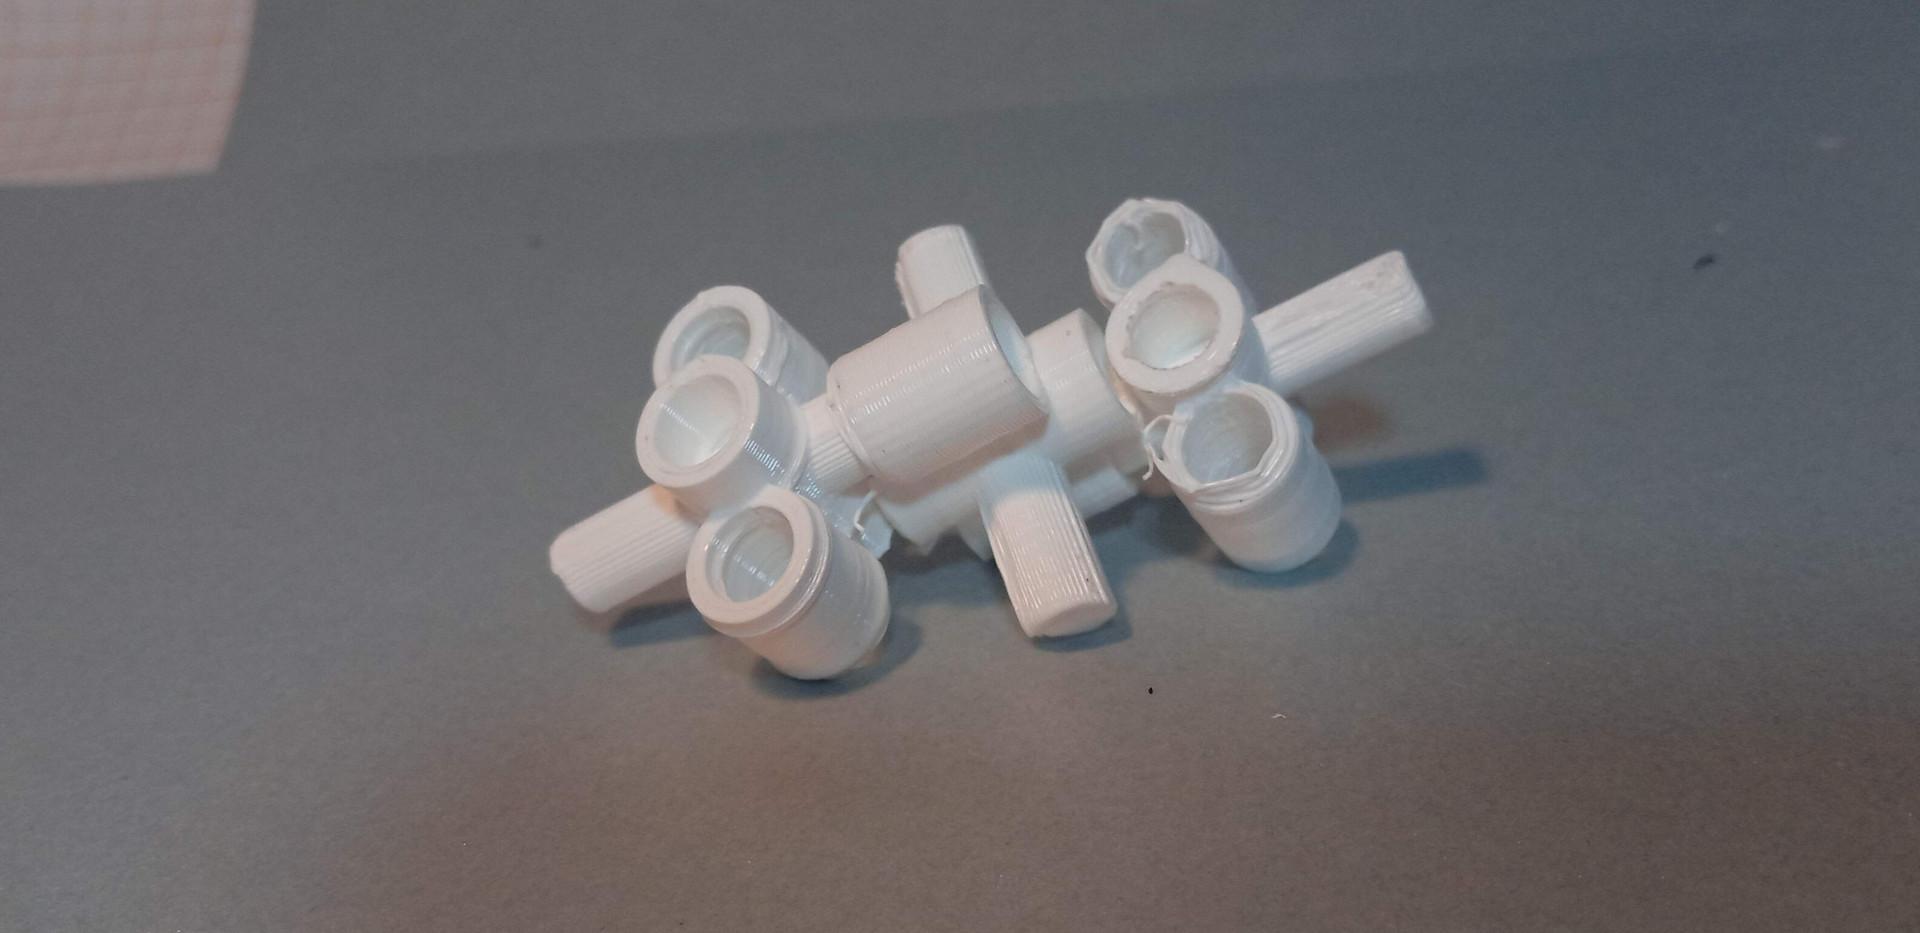 Três Módulos ModoriTuk, sistema de módulos construtivos interconectáveis